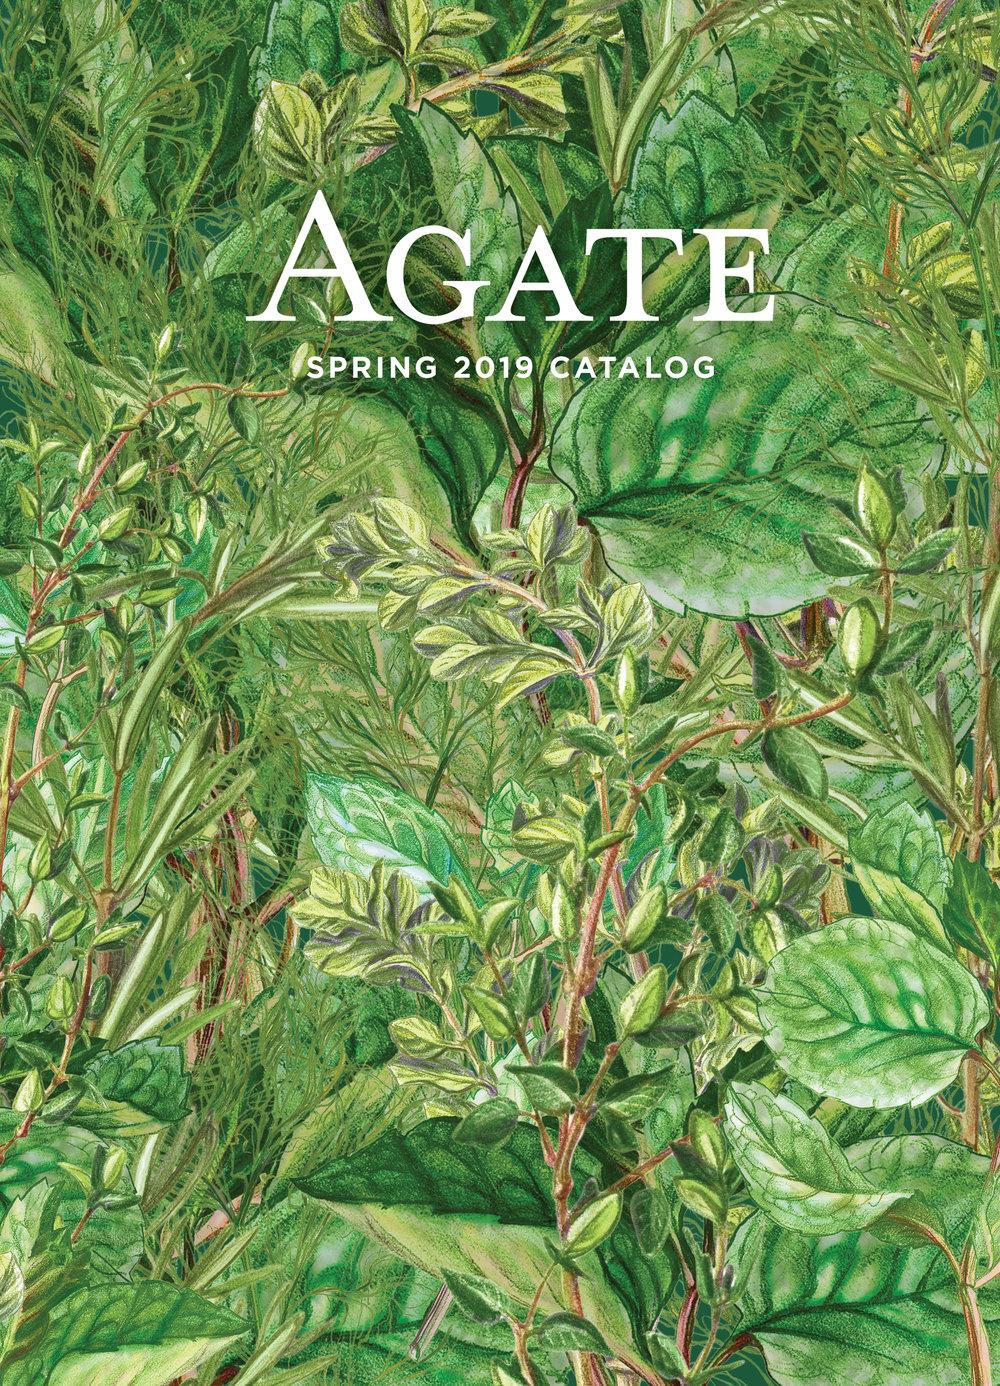 Agate Publishing Fall 2016 Catalog